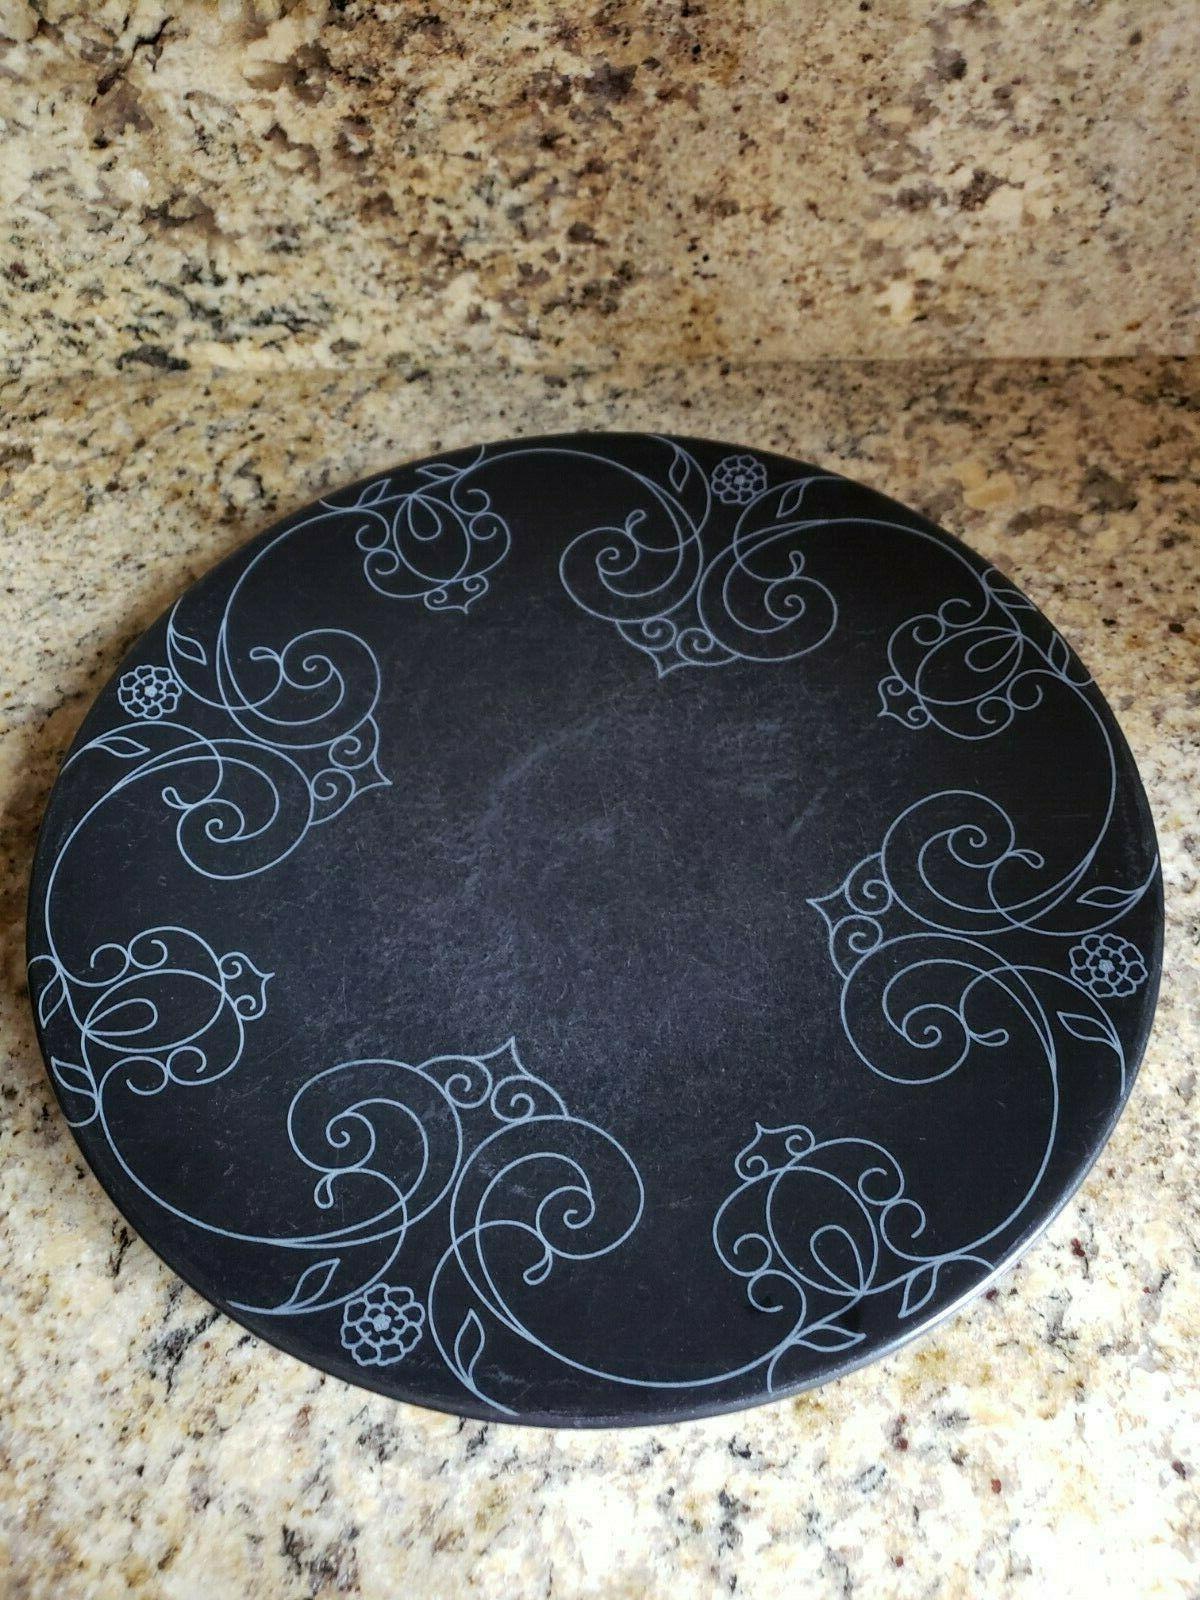 Brand New 16 Piece Oneida Dinnerware